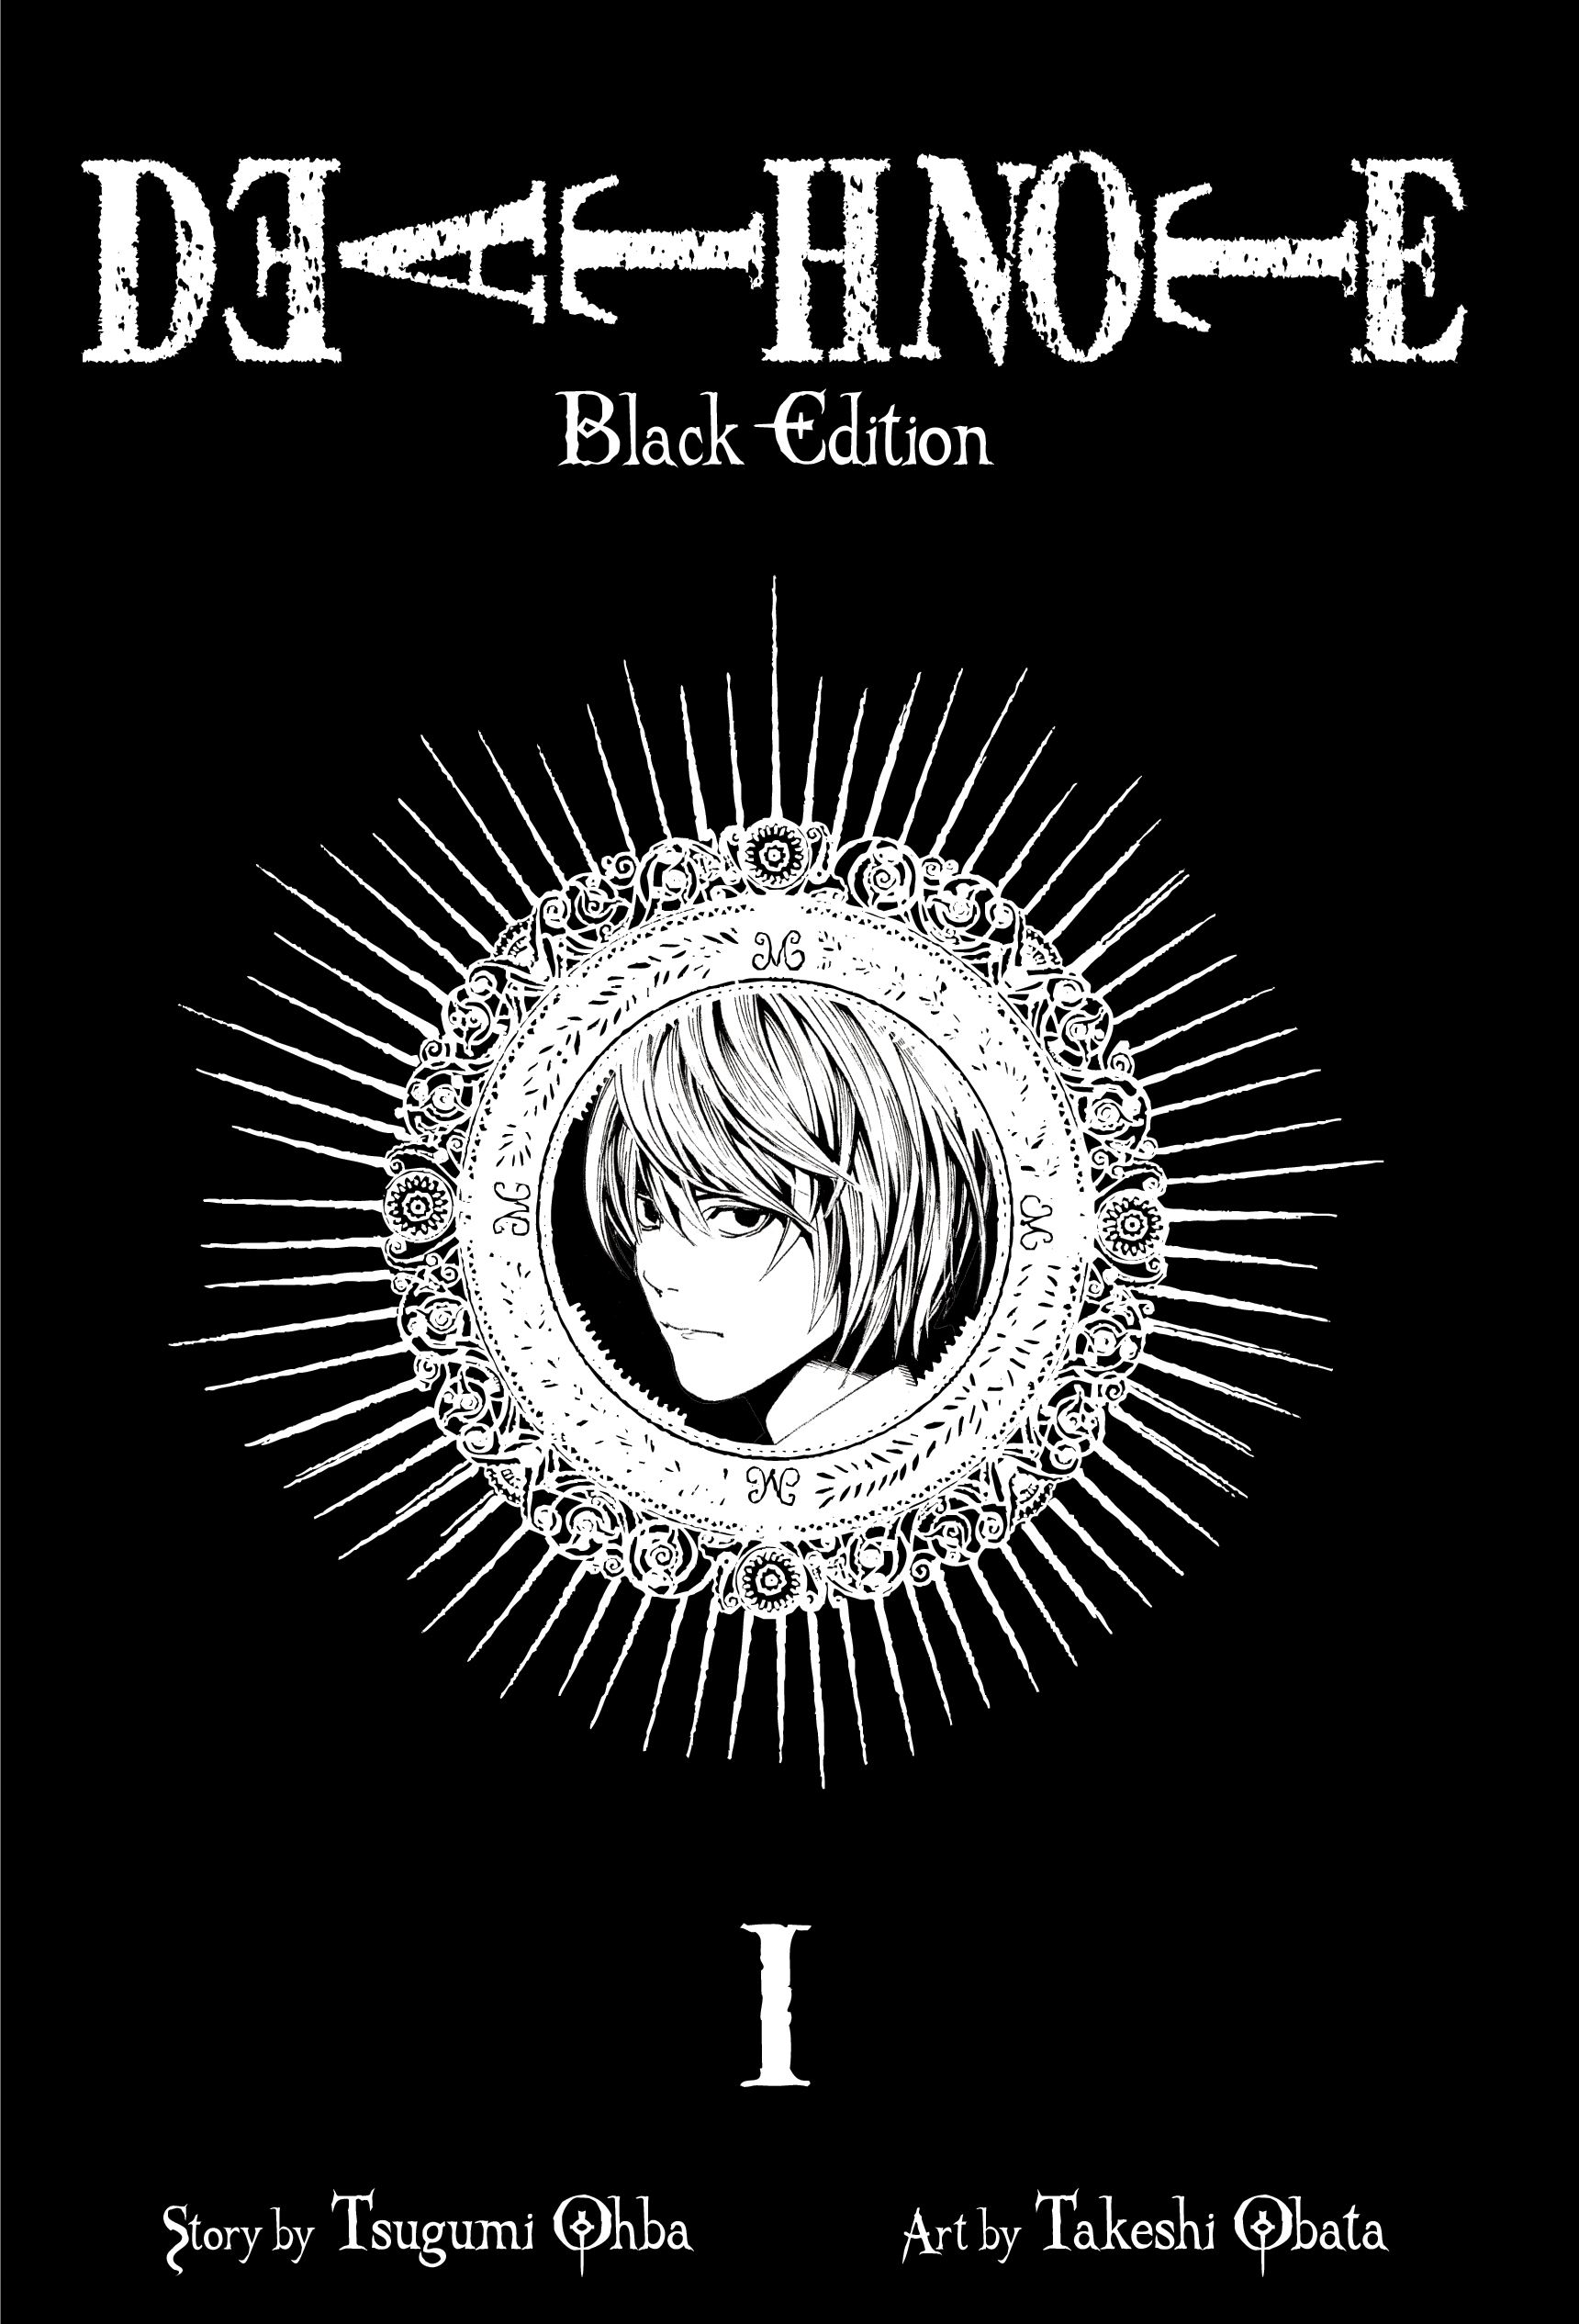 Death note black edition vol 1 9781421539645 hr